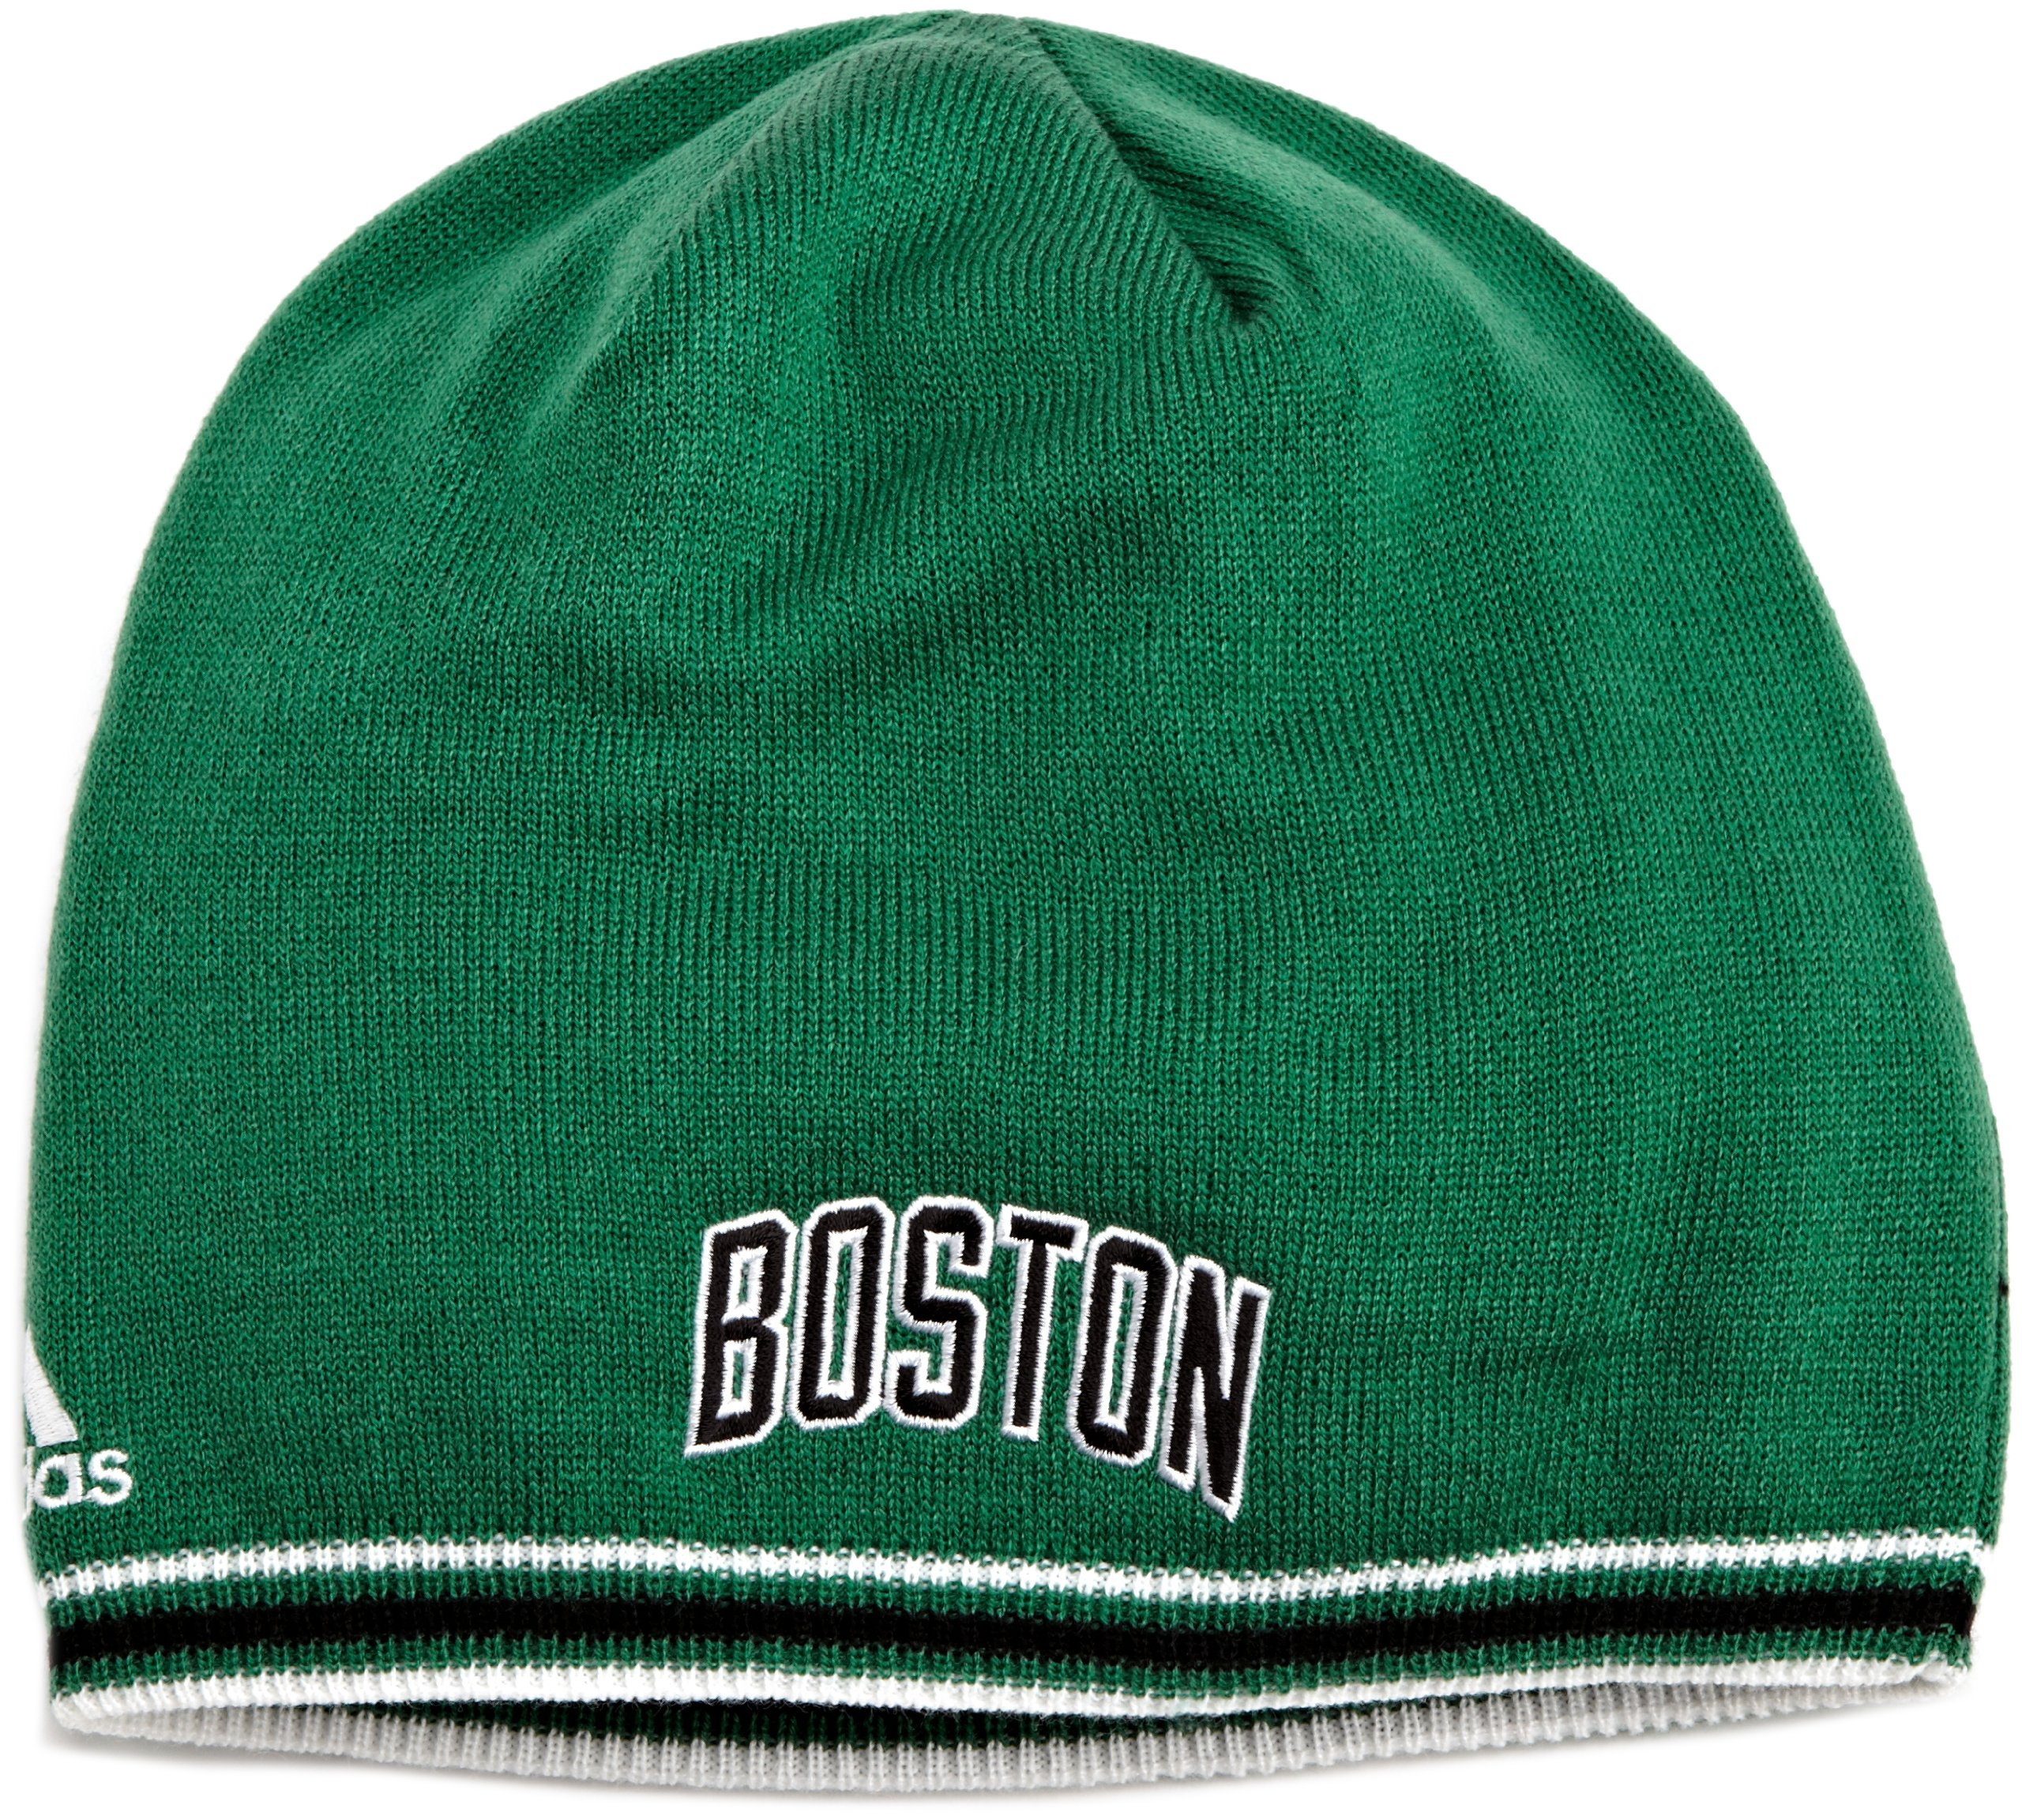 NBA Authentic Team Knit Hat - Kf12Z, Boston Celtics, One Size , Boston Celtics , Kelly Green